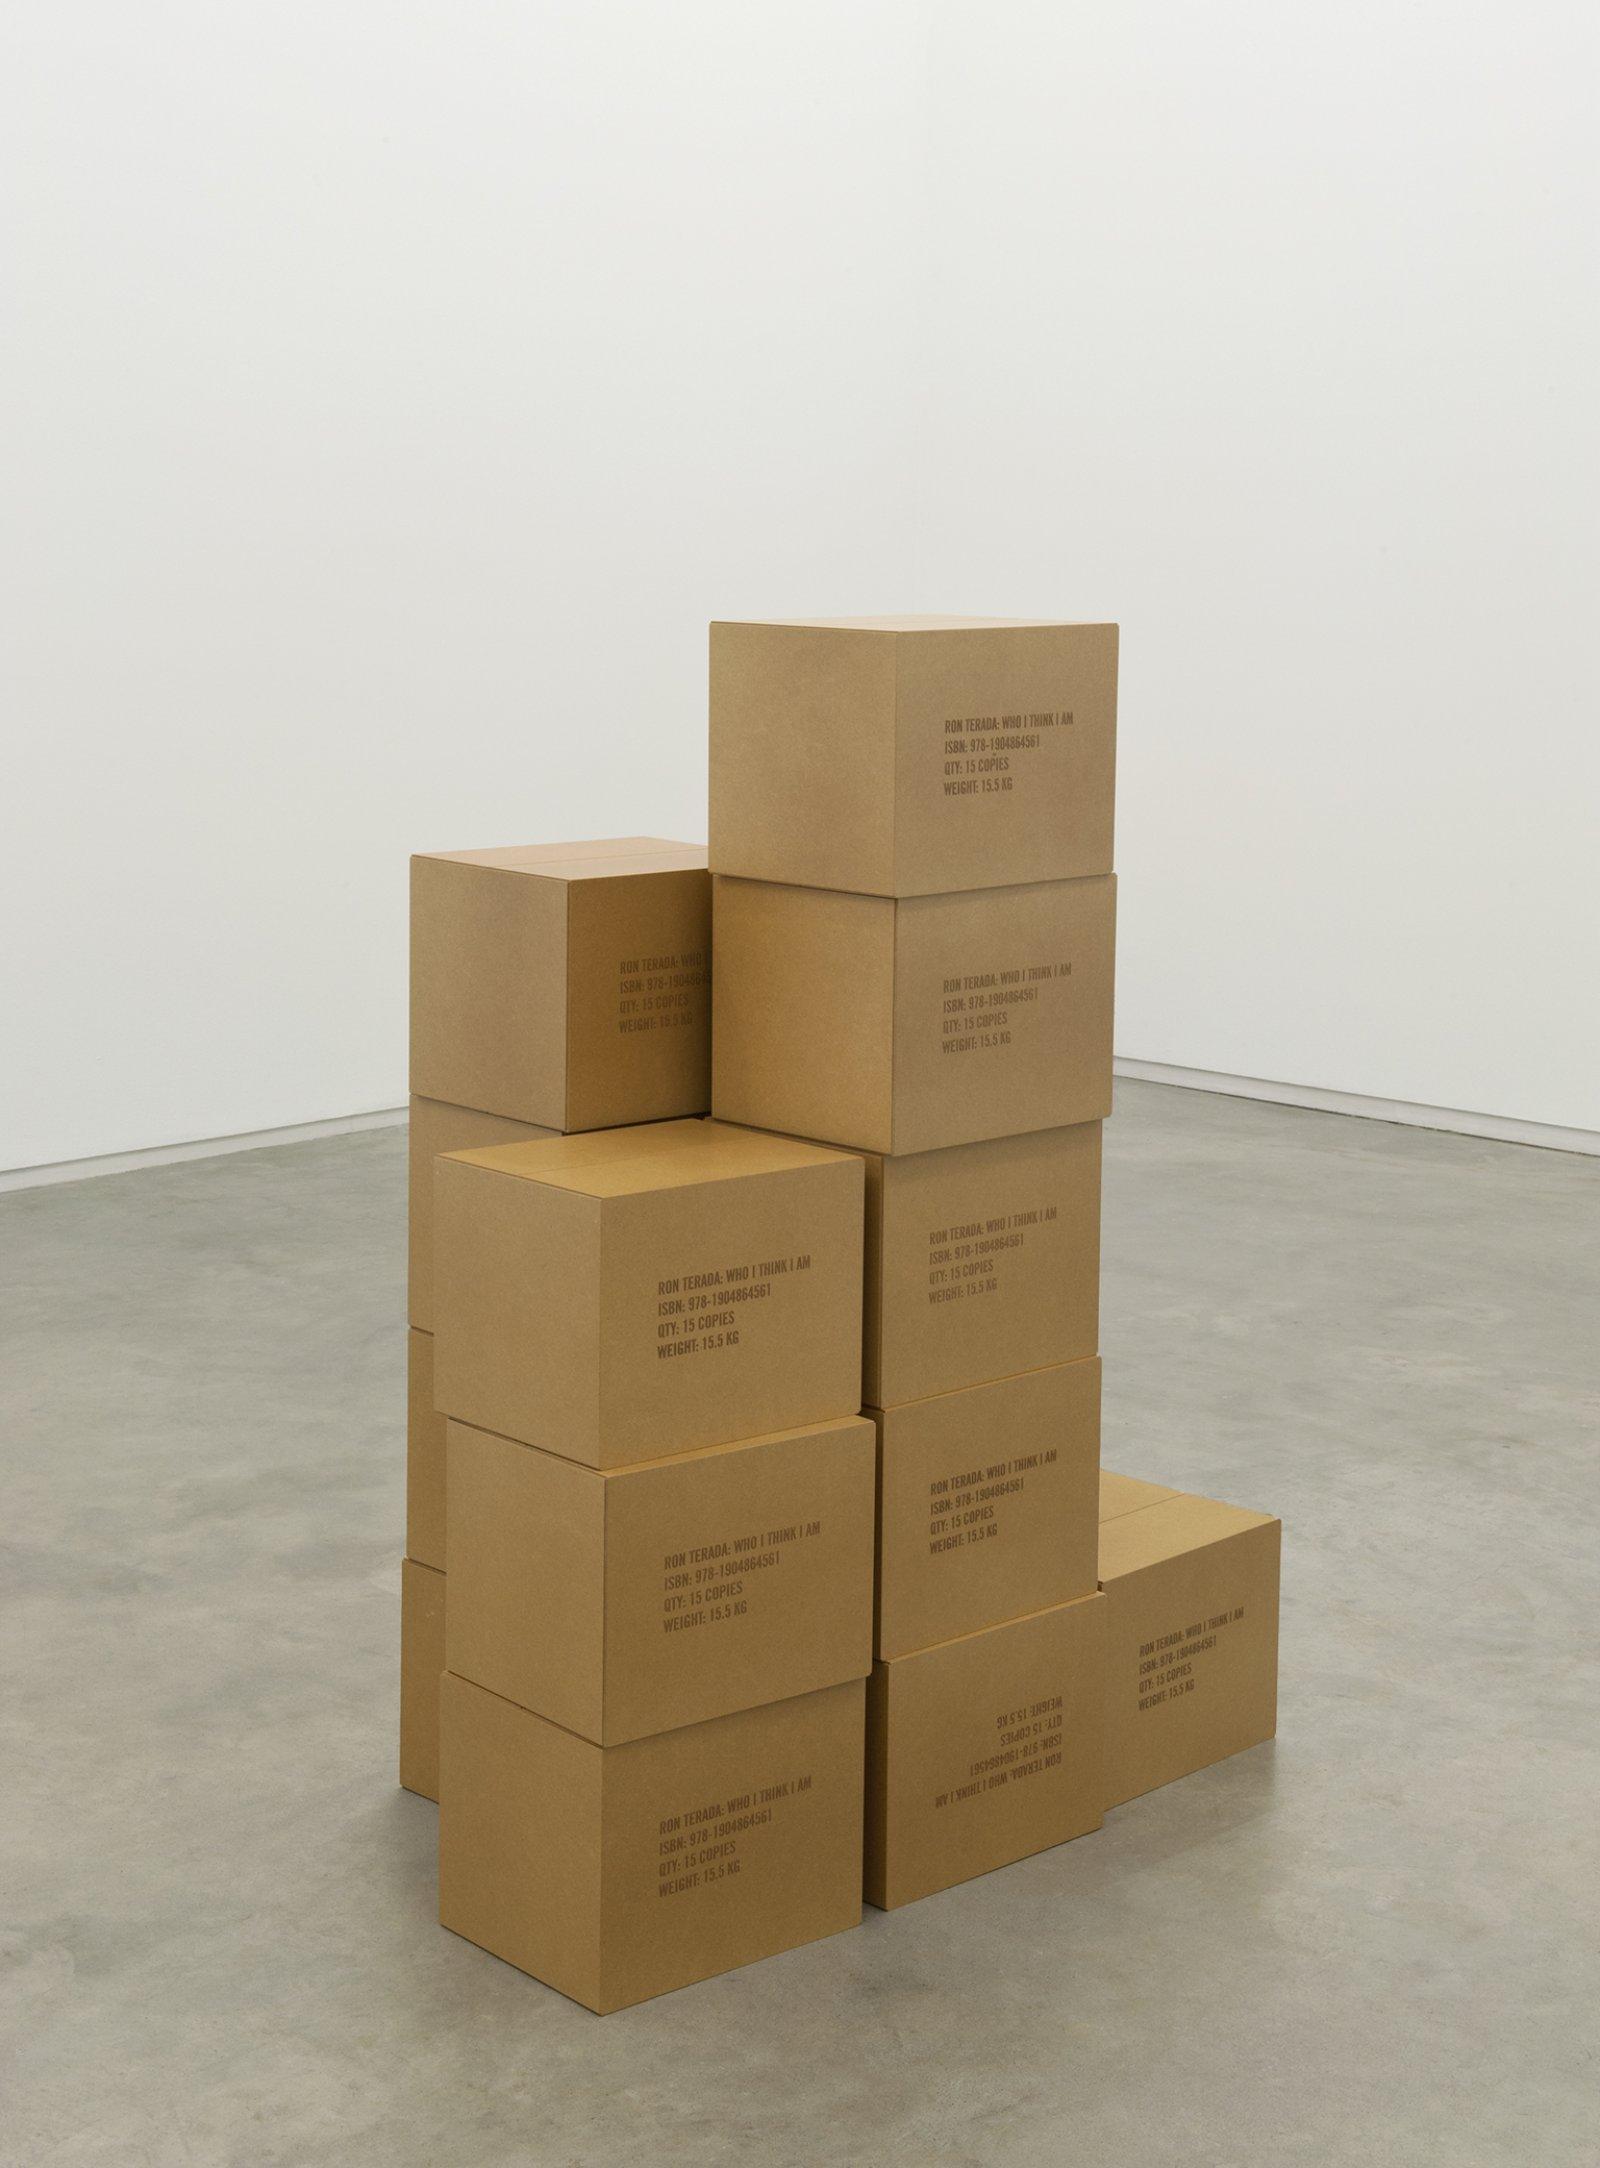 Ron Terada,Who I Think I Am, 2011, 15 MDF boxes, varnish, each 10 x 13 x 11 in. (26 x 33 x 27 cm)